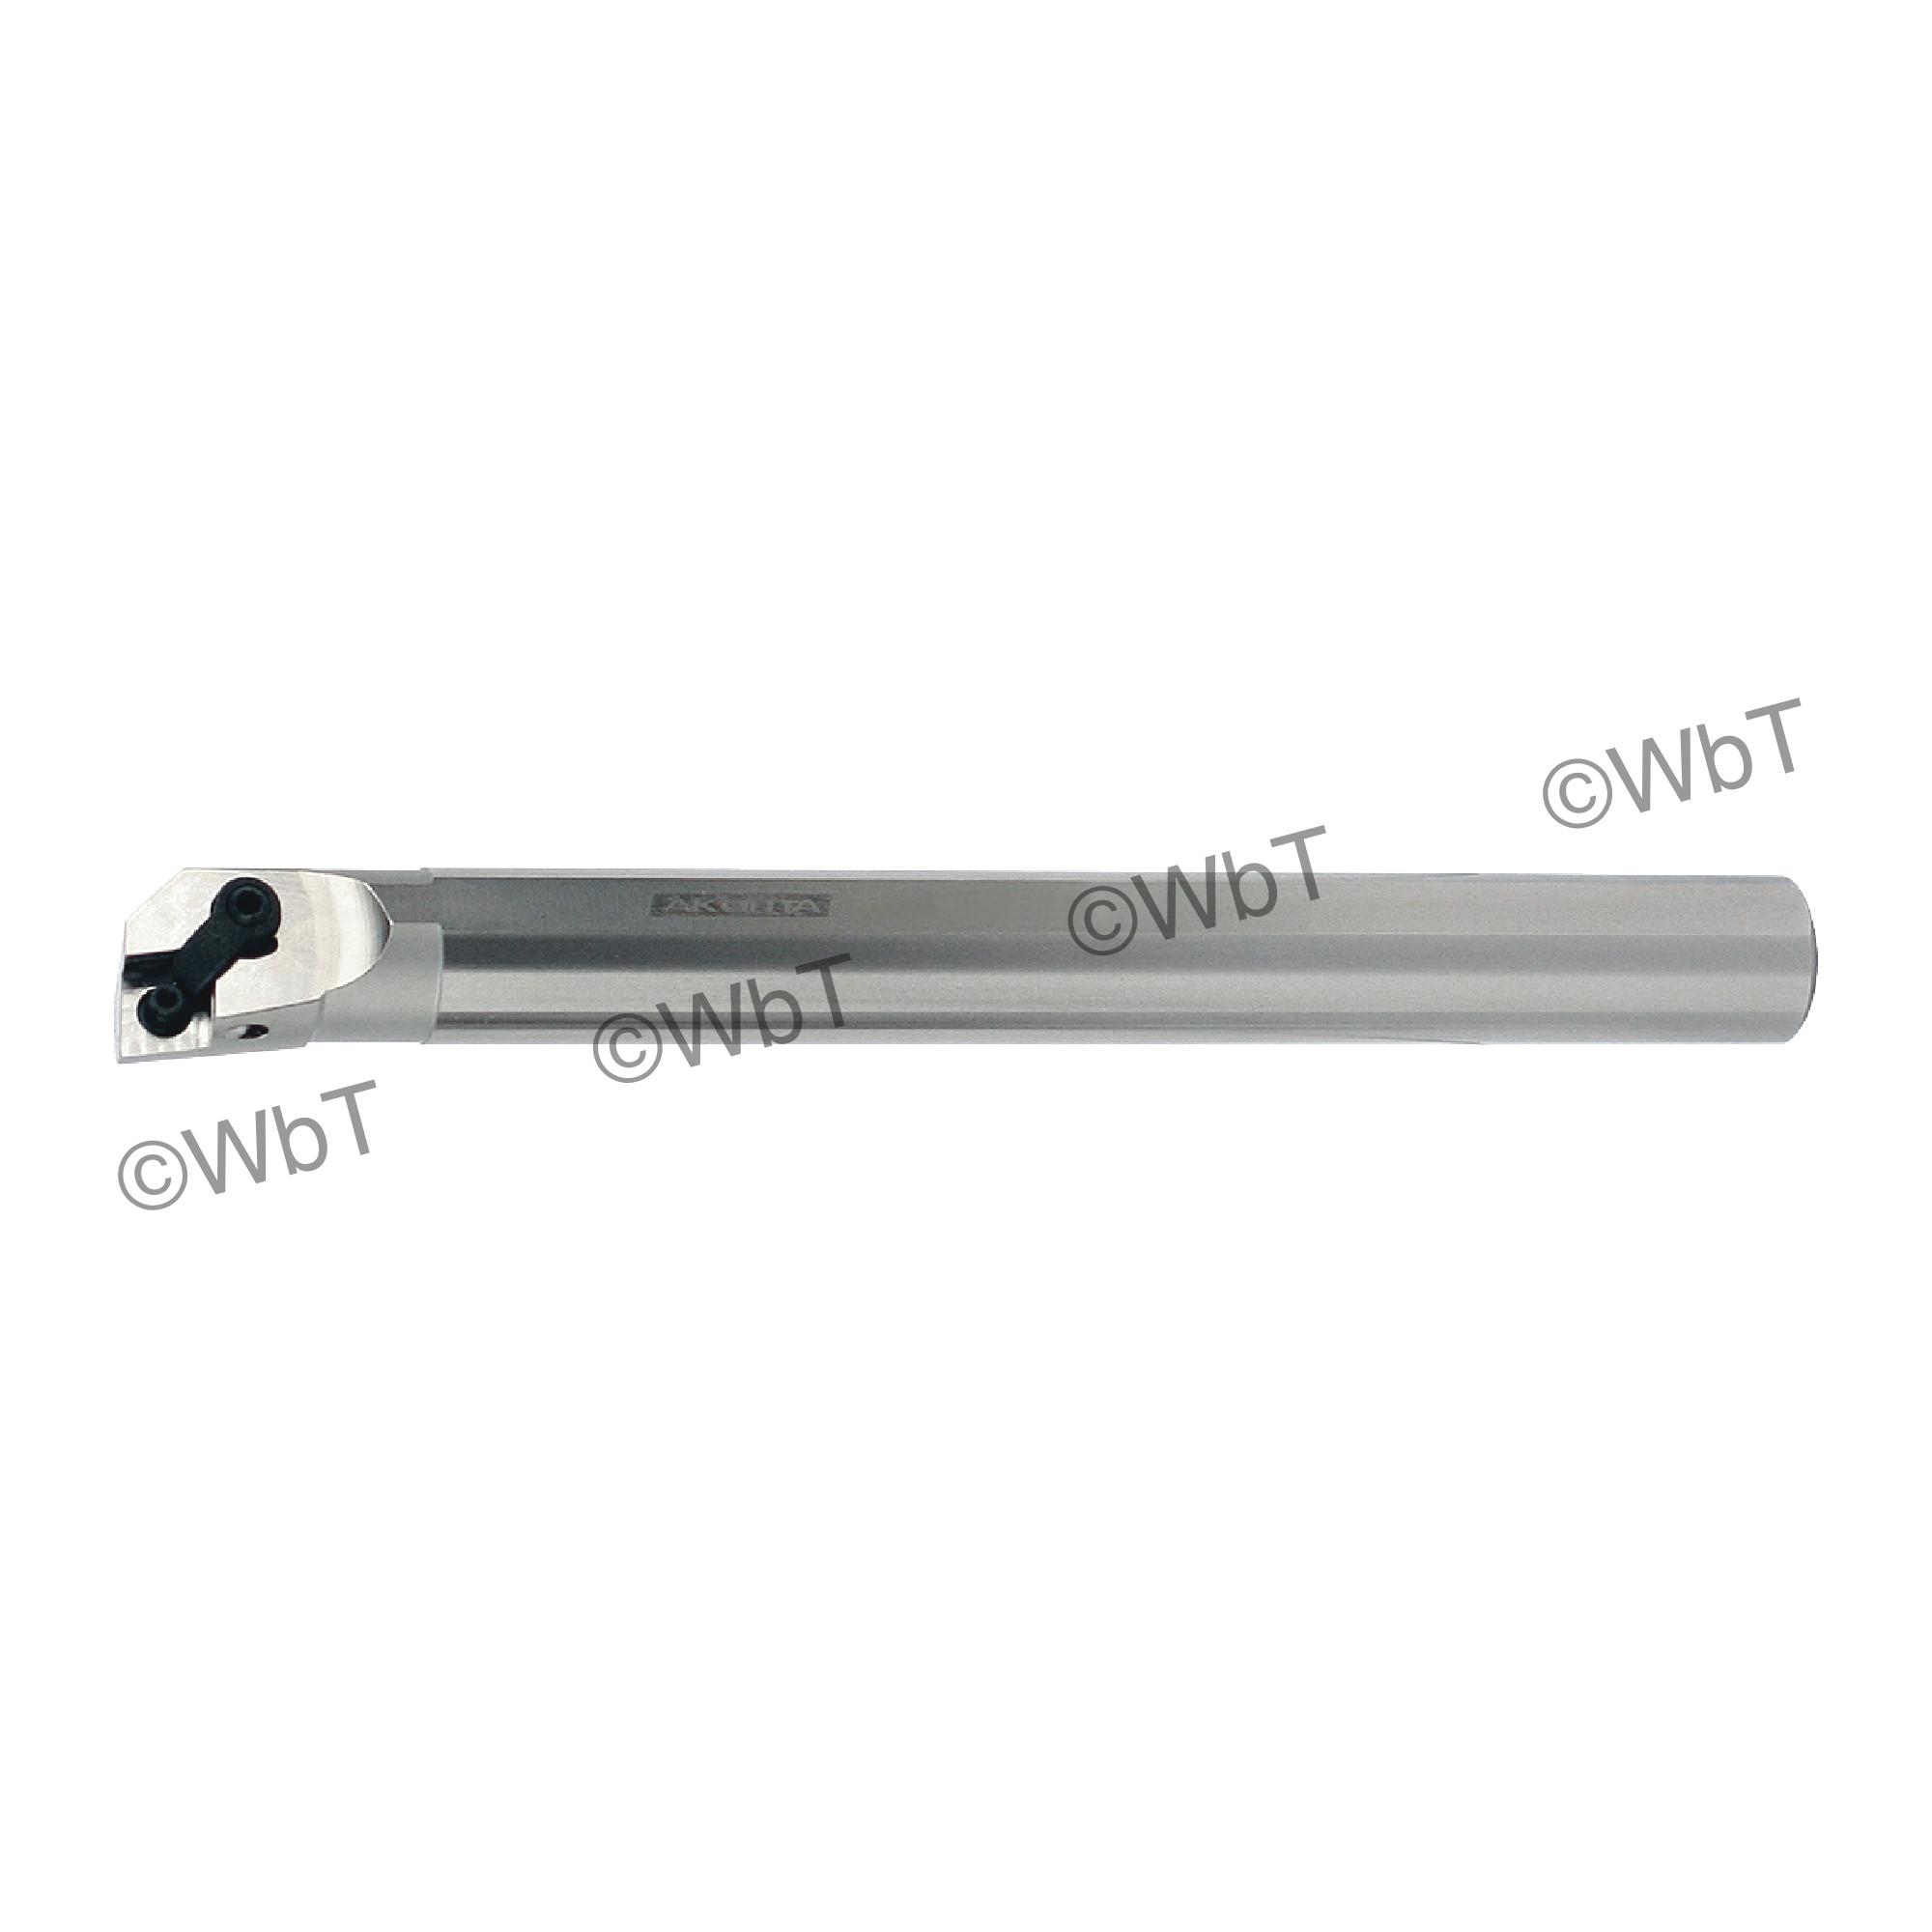 "AKUMA - A16S-MCLNL-4 / Steel Boring Bar / 1.000"" Shank / CNMG43_ / Coolant Thru / Left Hand"